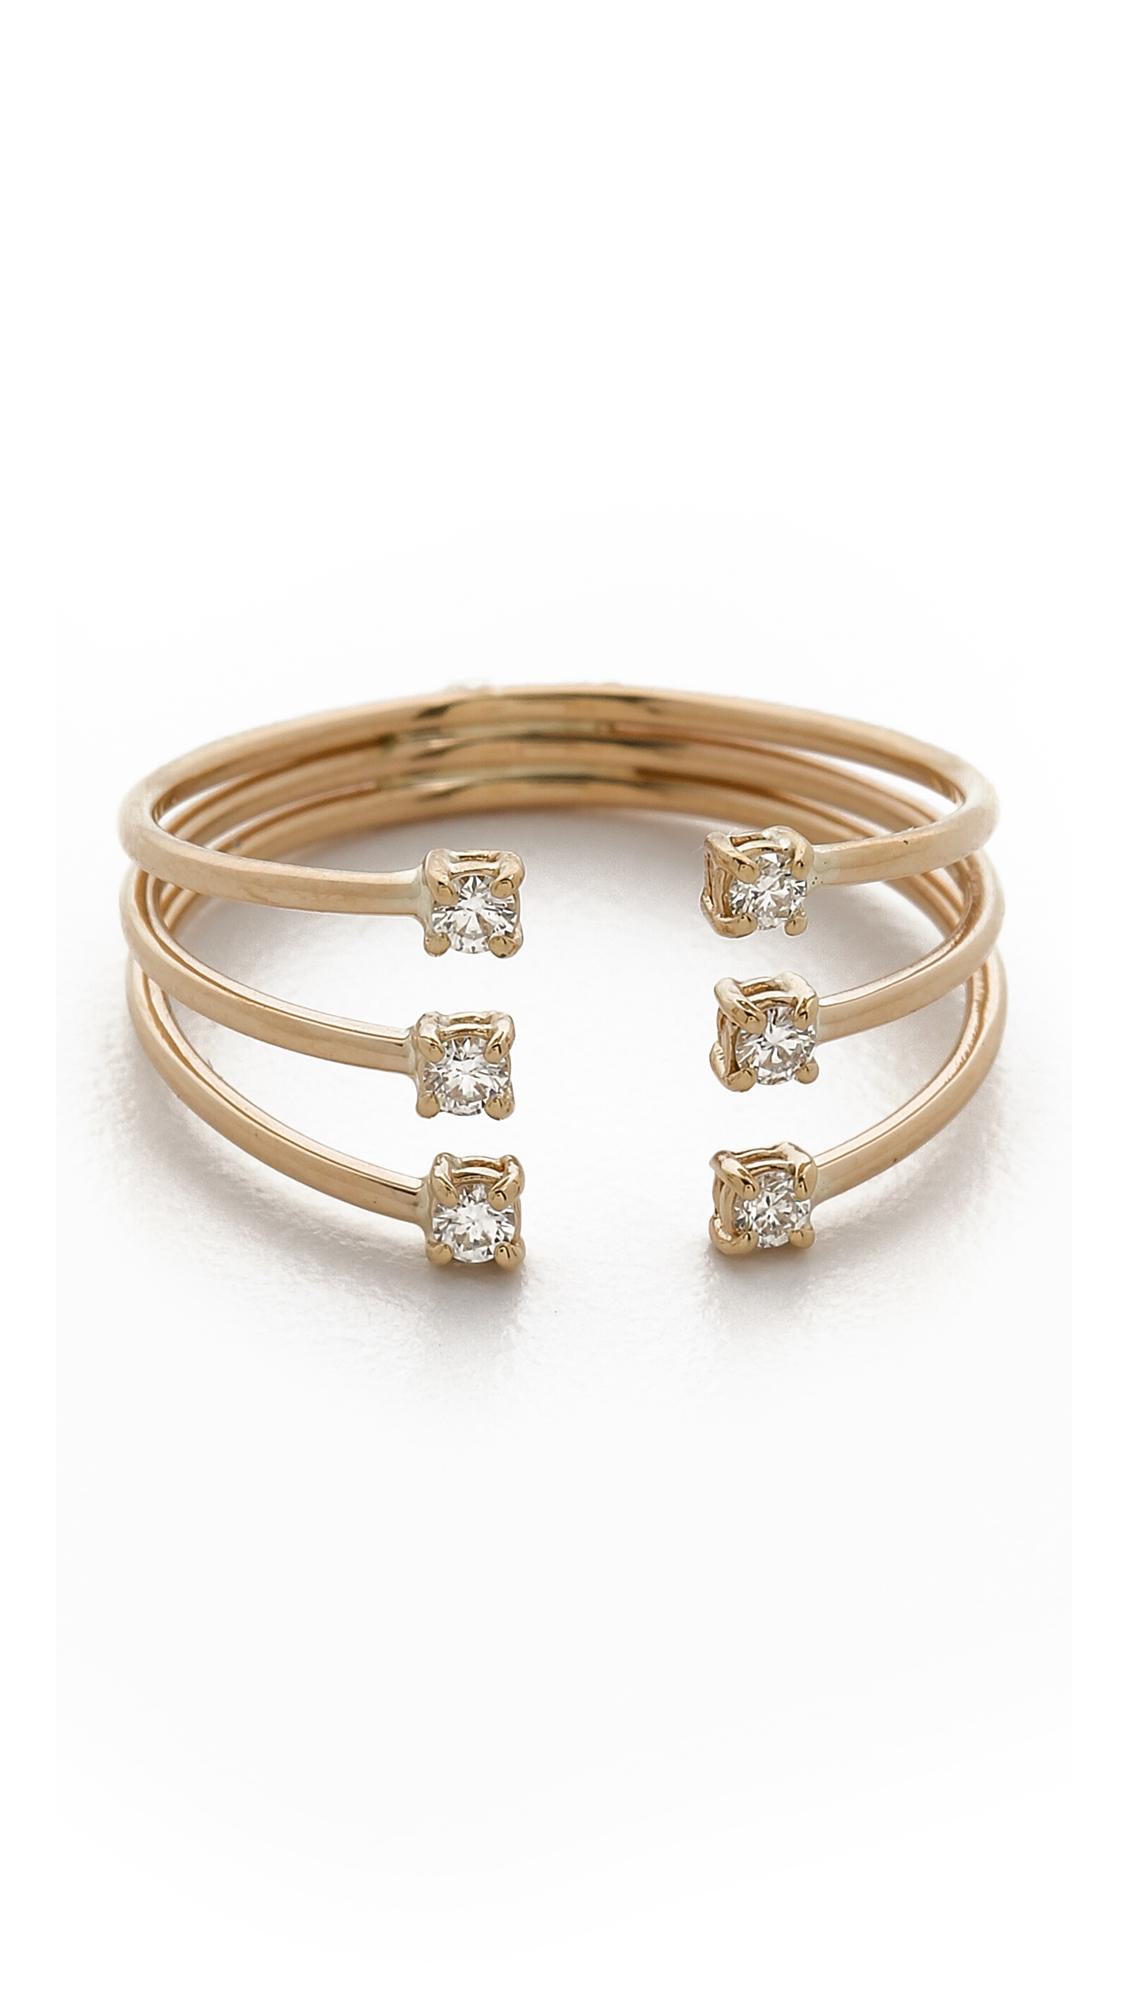 Lyst - Jennie Kwon Diamond Cage Cuff Ring - Gold/clear in Metallic